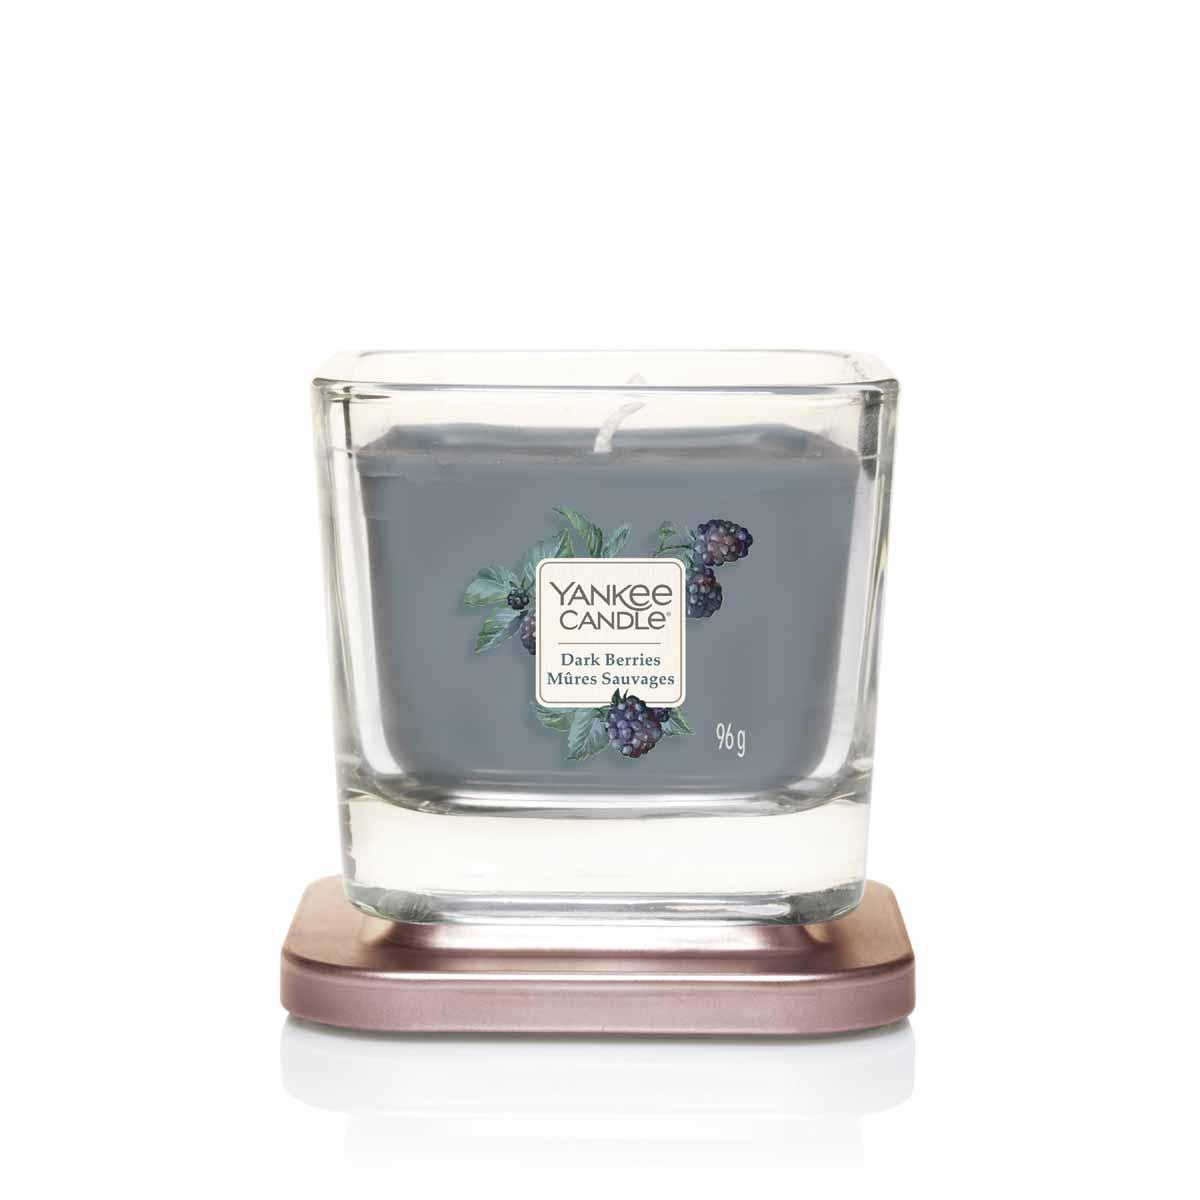 Yankee Candle Dark Berries Giara Piccola